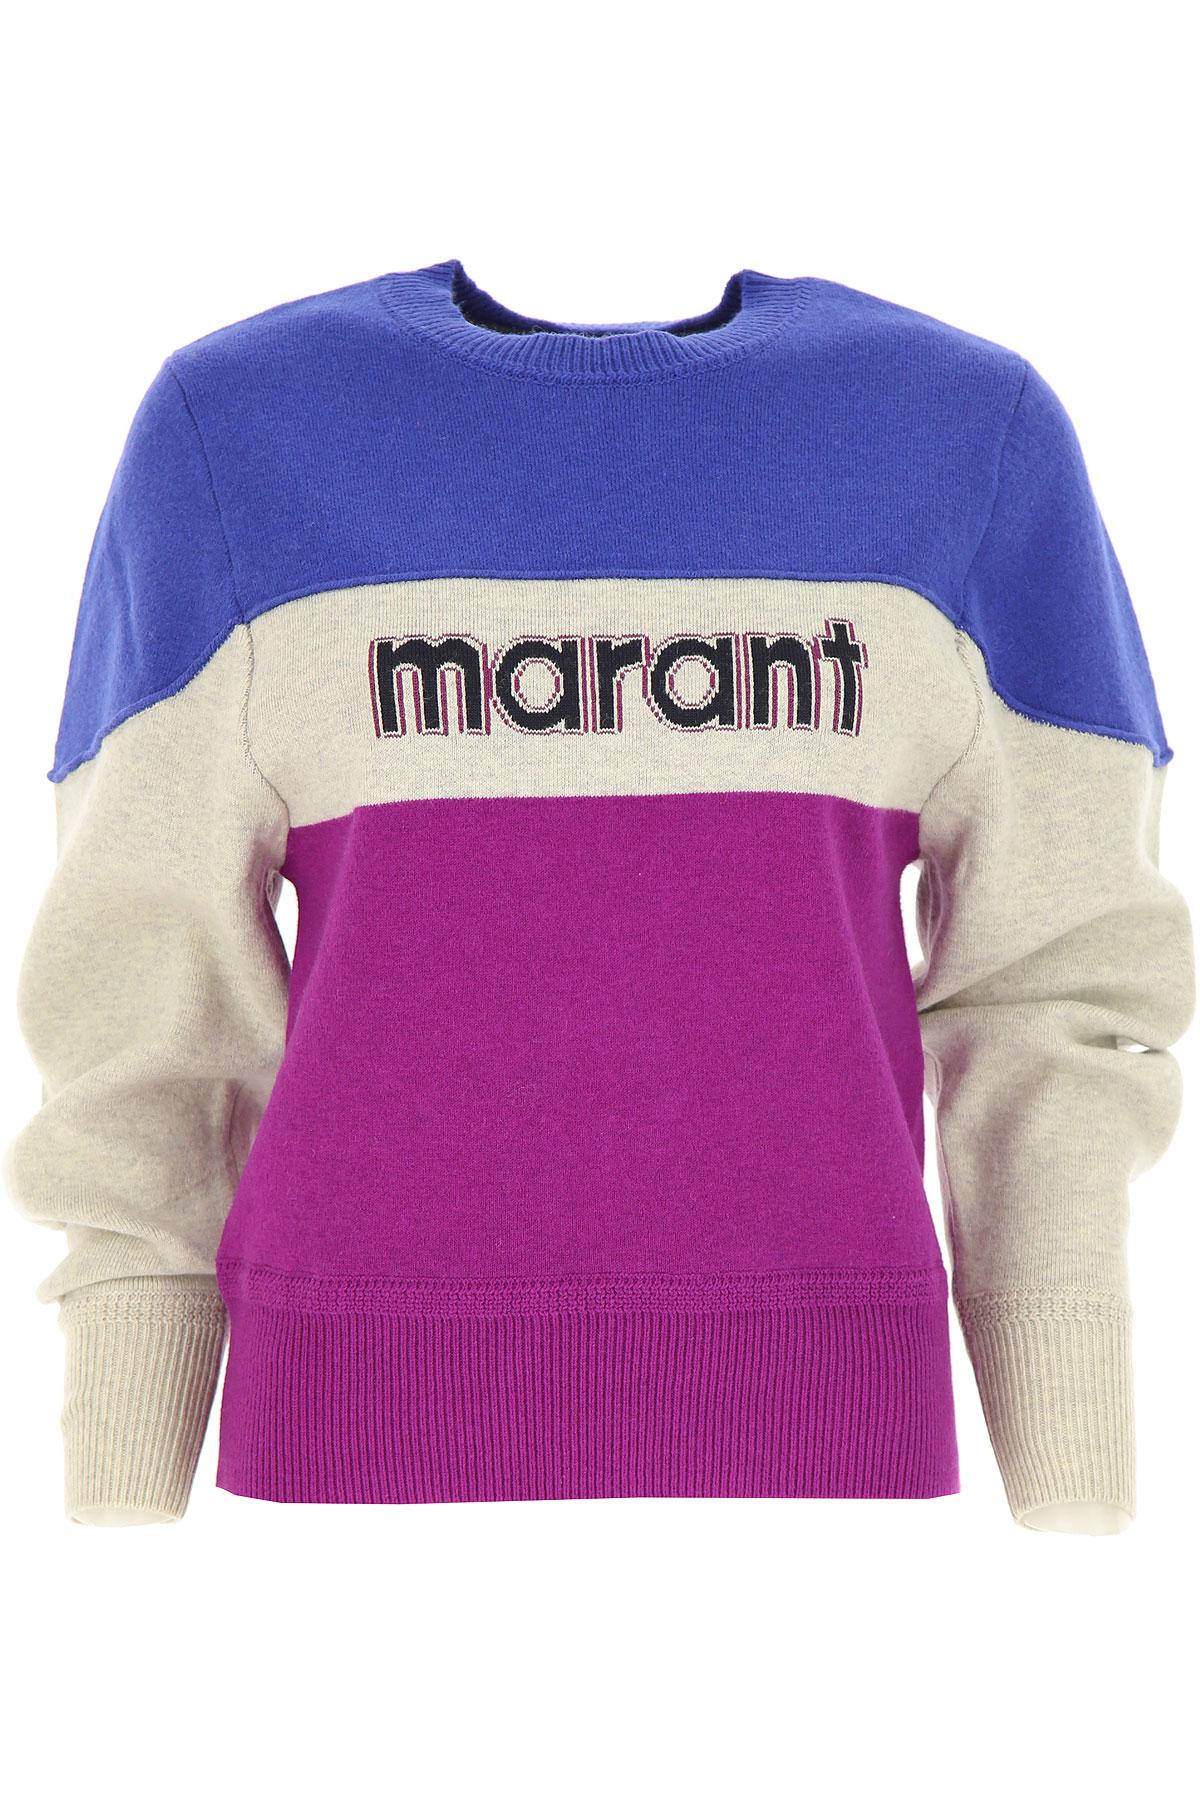 Isabel Marant Sweater for Women Jumper On Sale, Blue, Cotton, 2019, 6 8